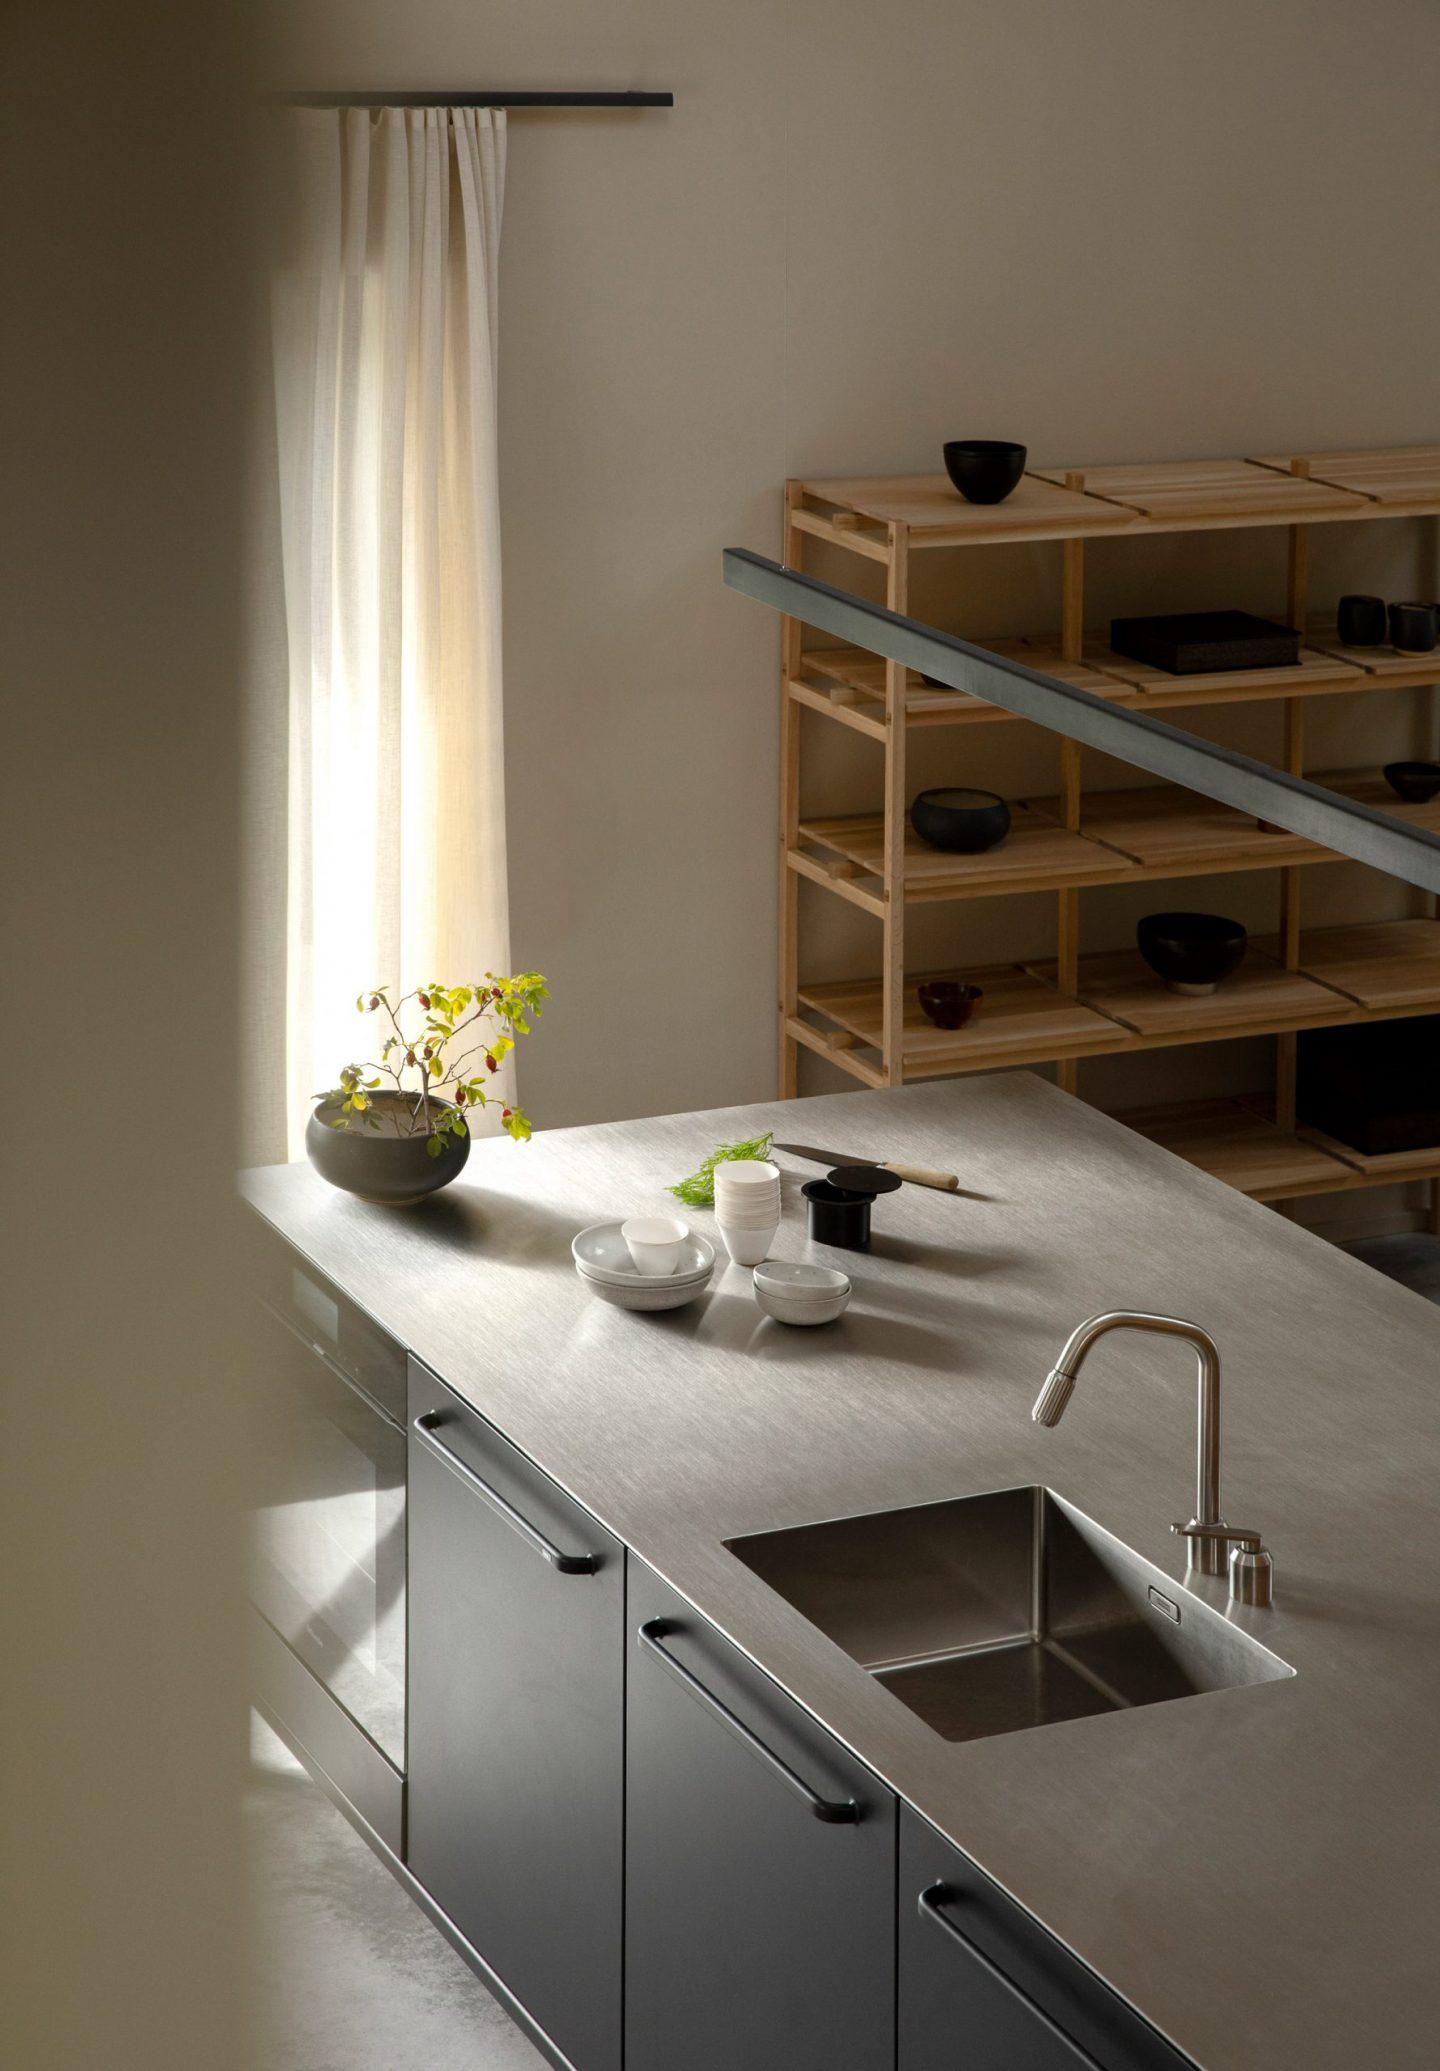 IGNANT-Architecture-Norm-Architects-Archipelago-House-01